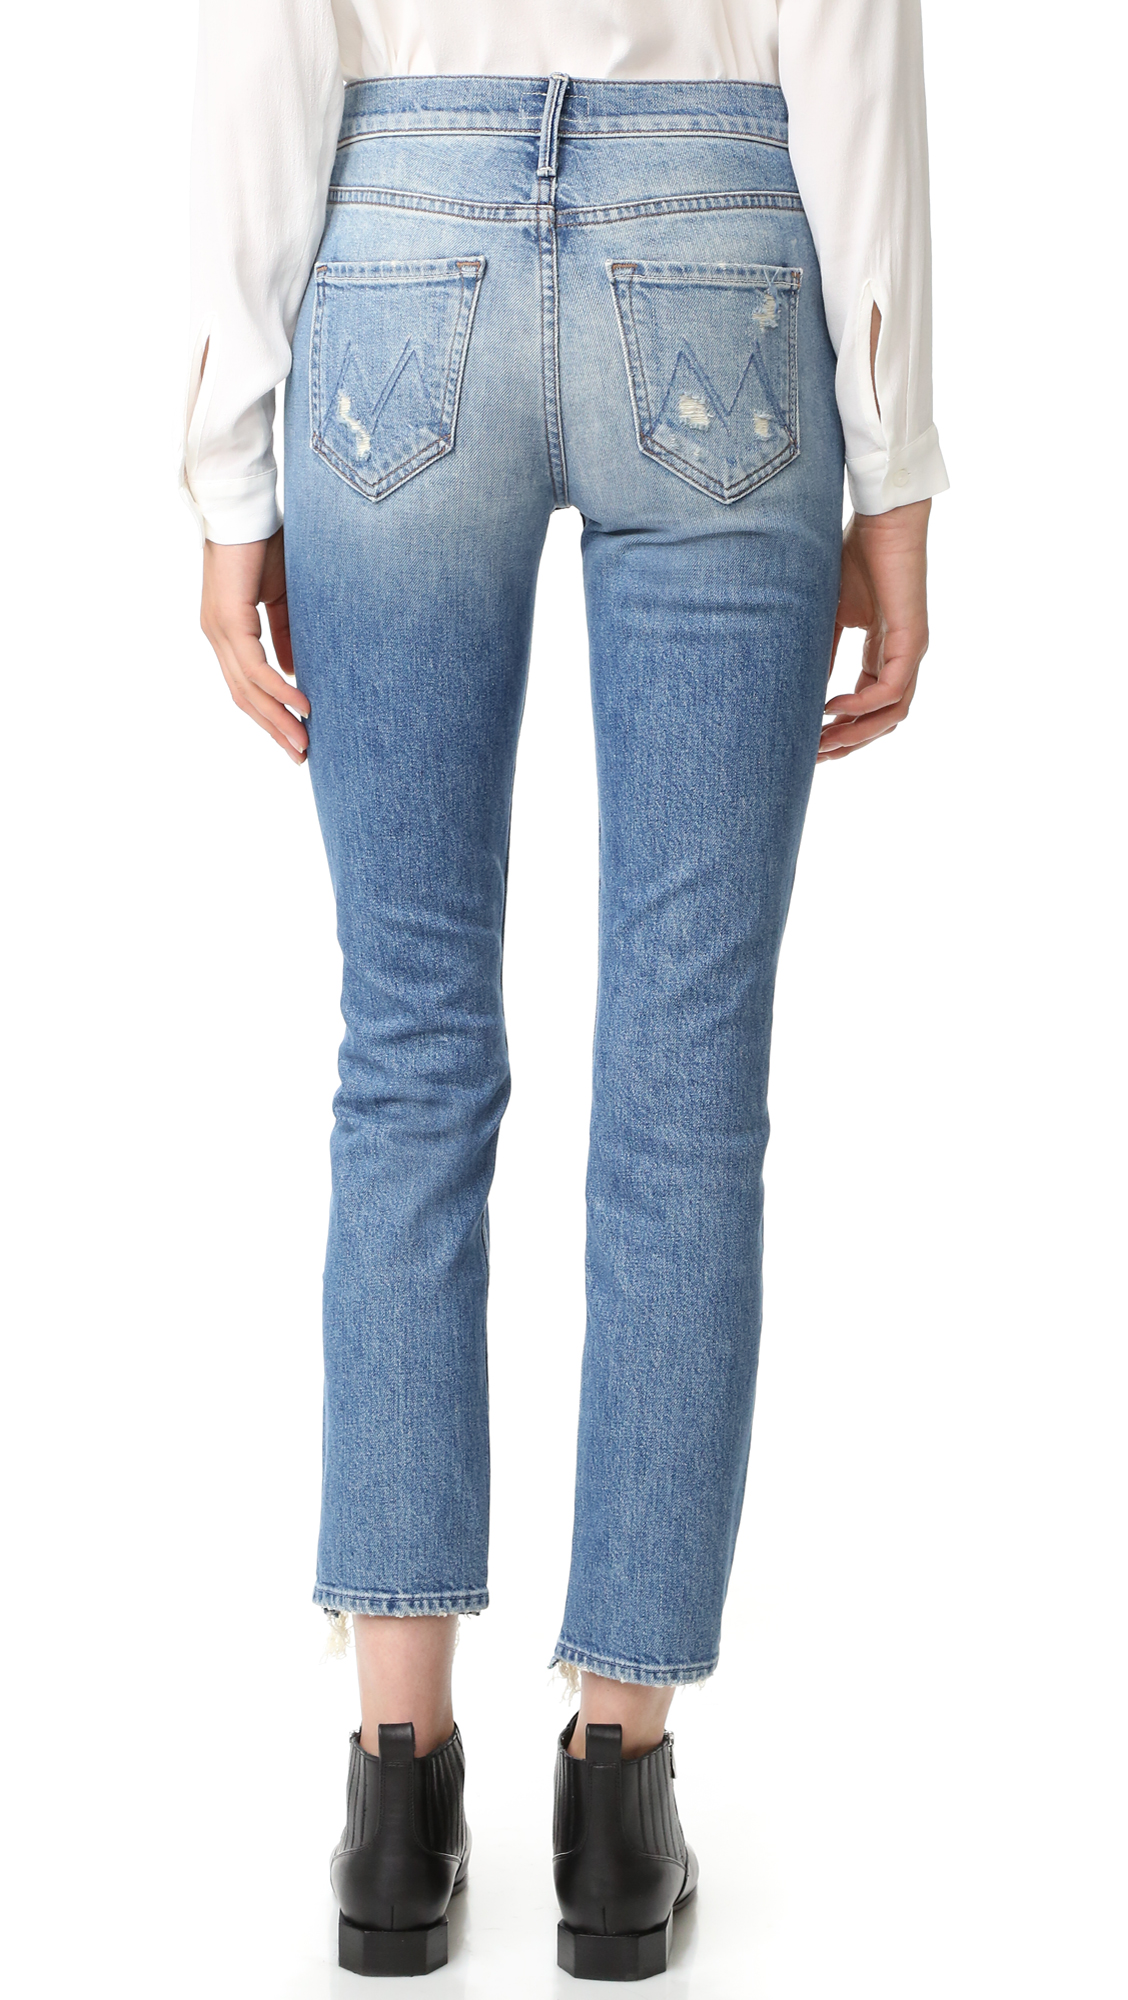 The Flirt Fray Jeans Mother 3RzgHccd